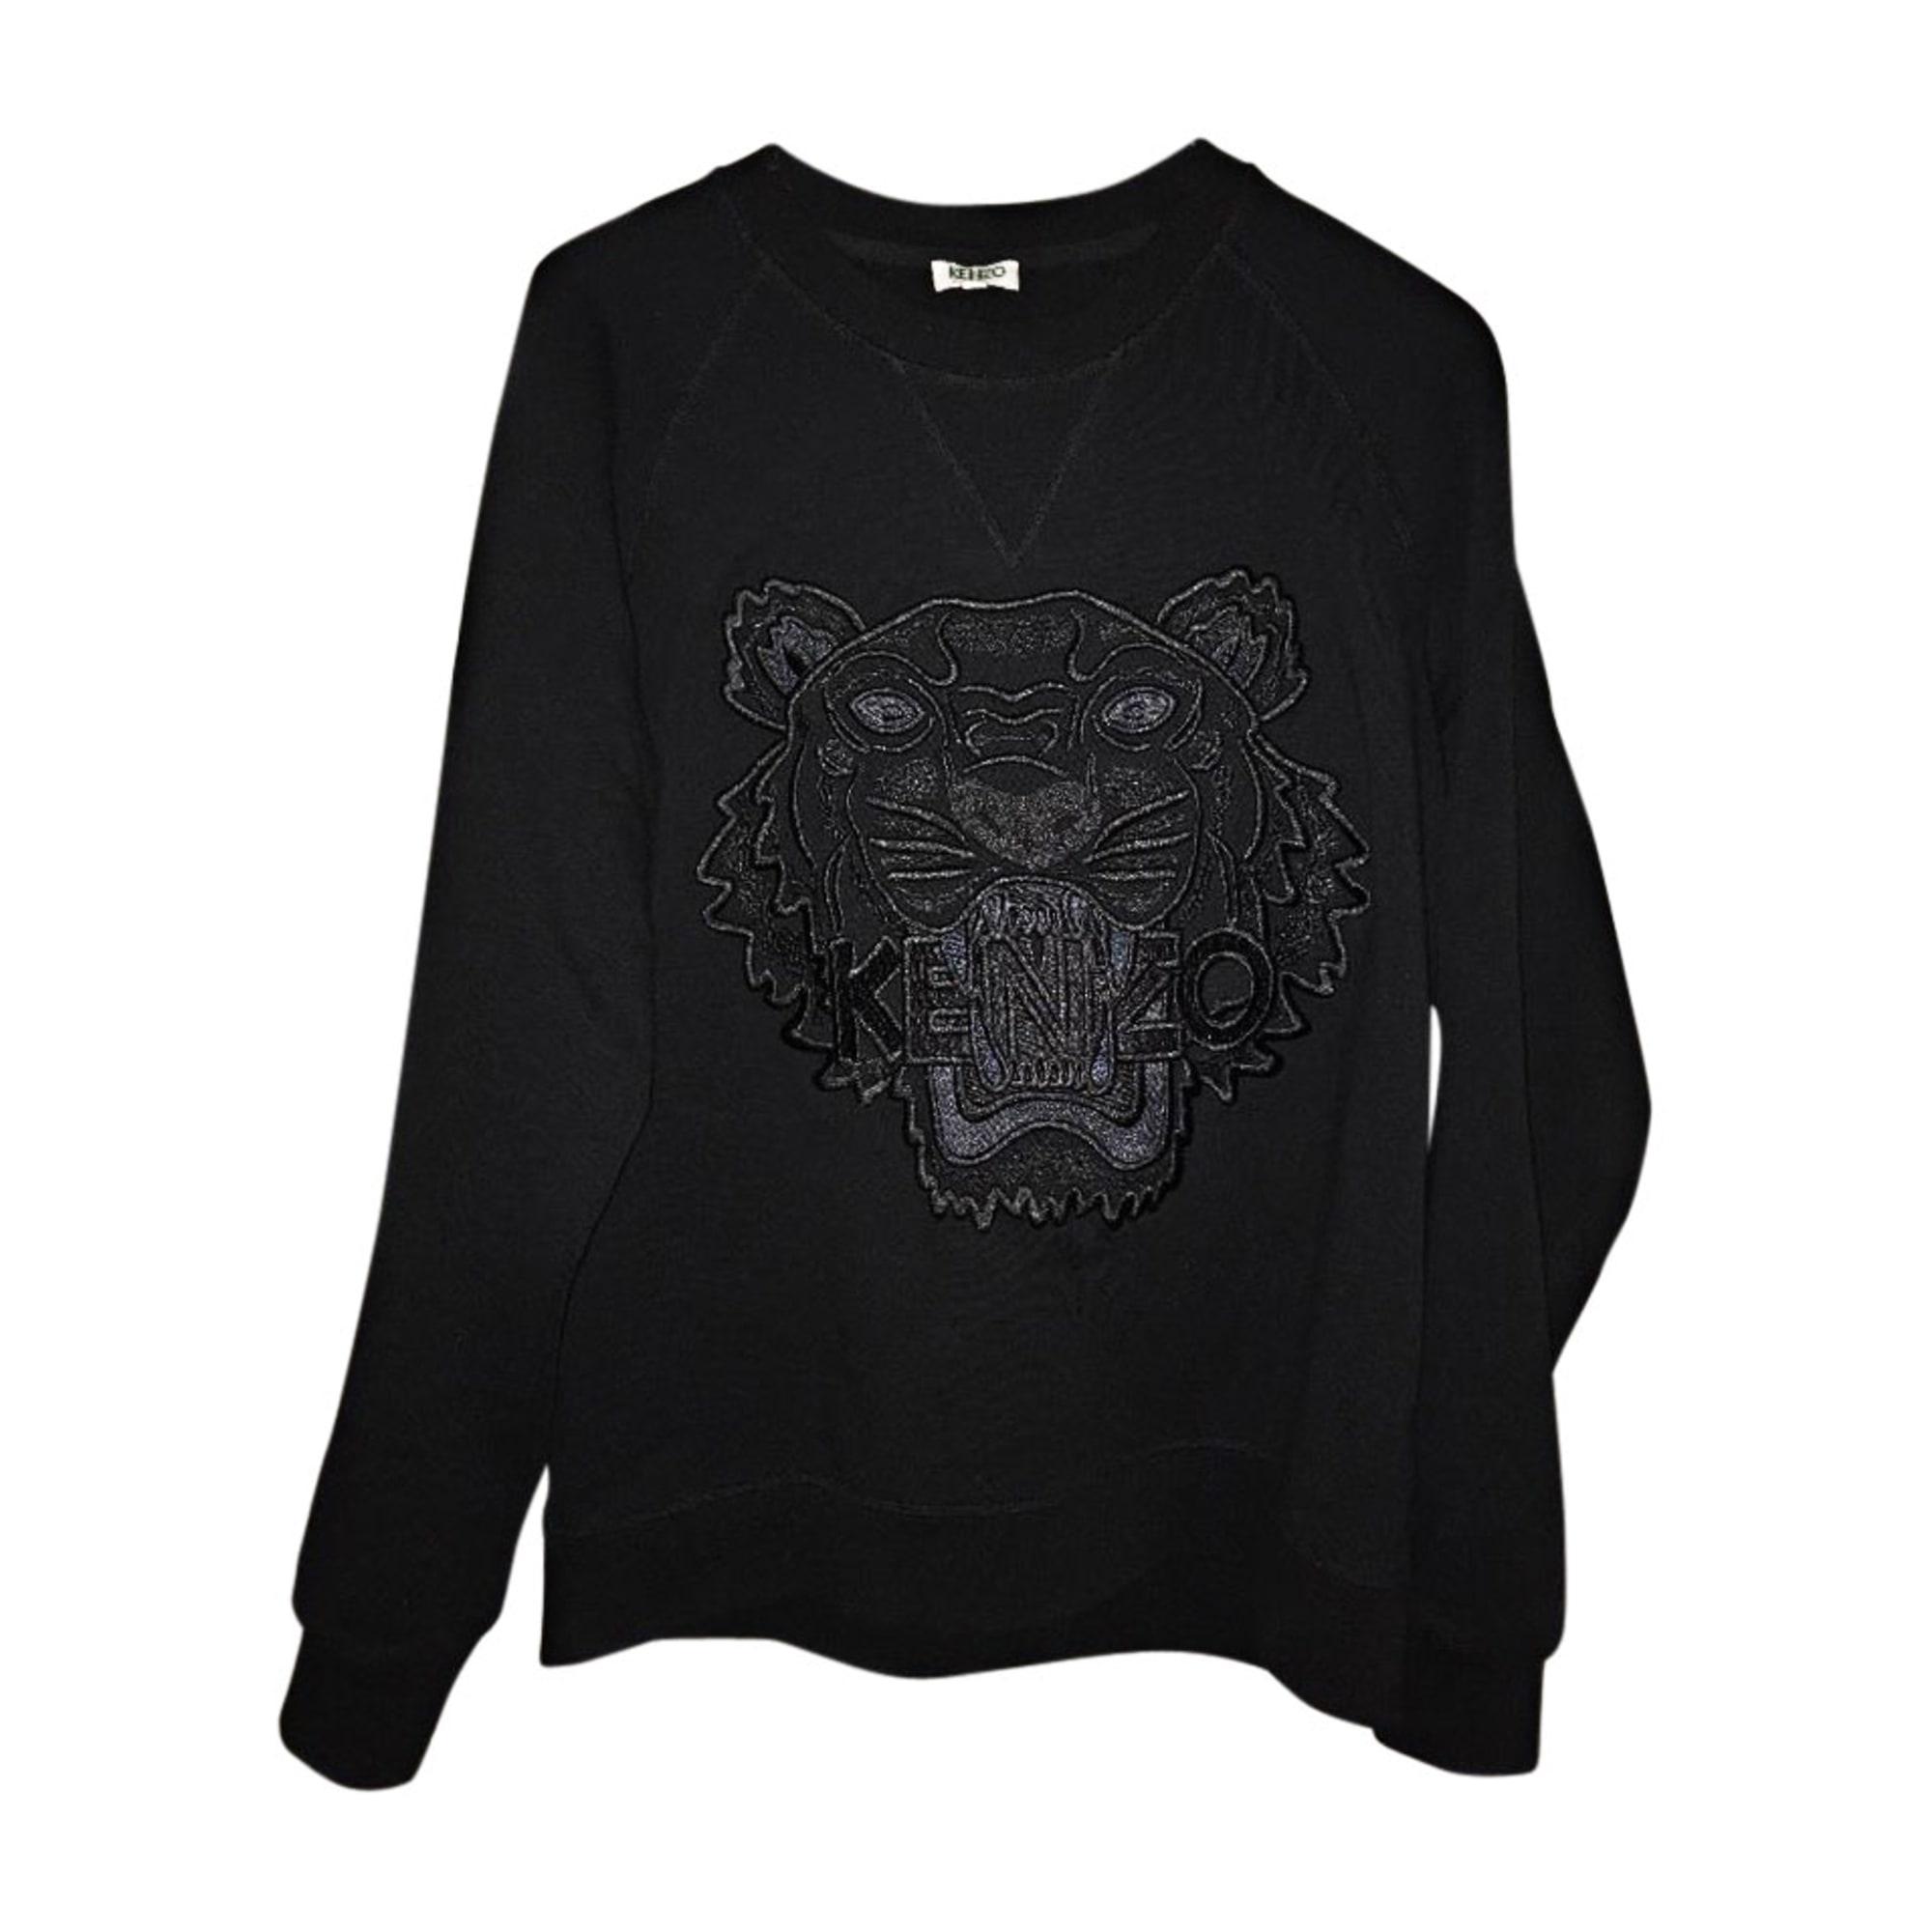 Pull KENZO 3 (L) noir vendu par Sofiane 91 - 5716076 2fb164df78e